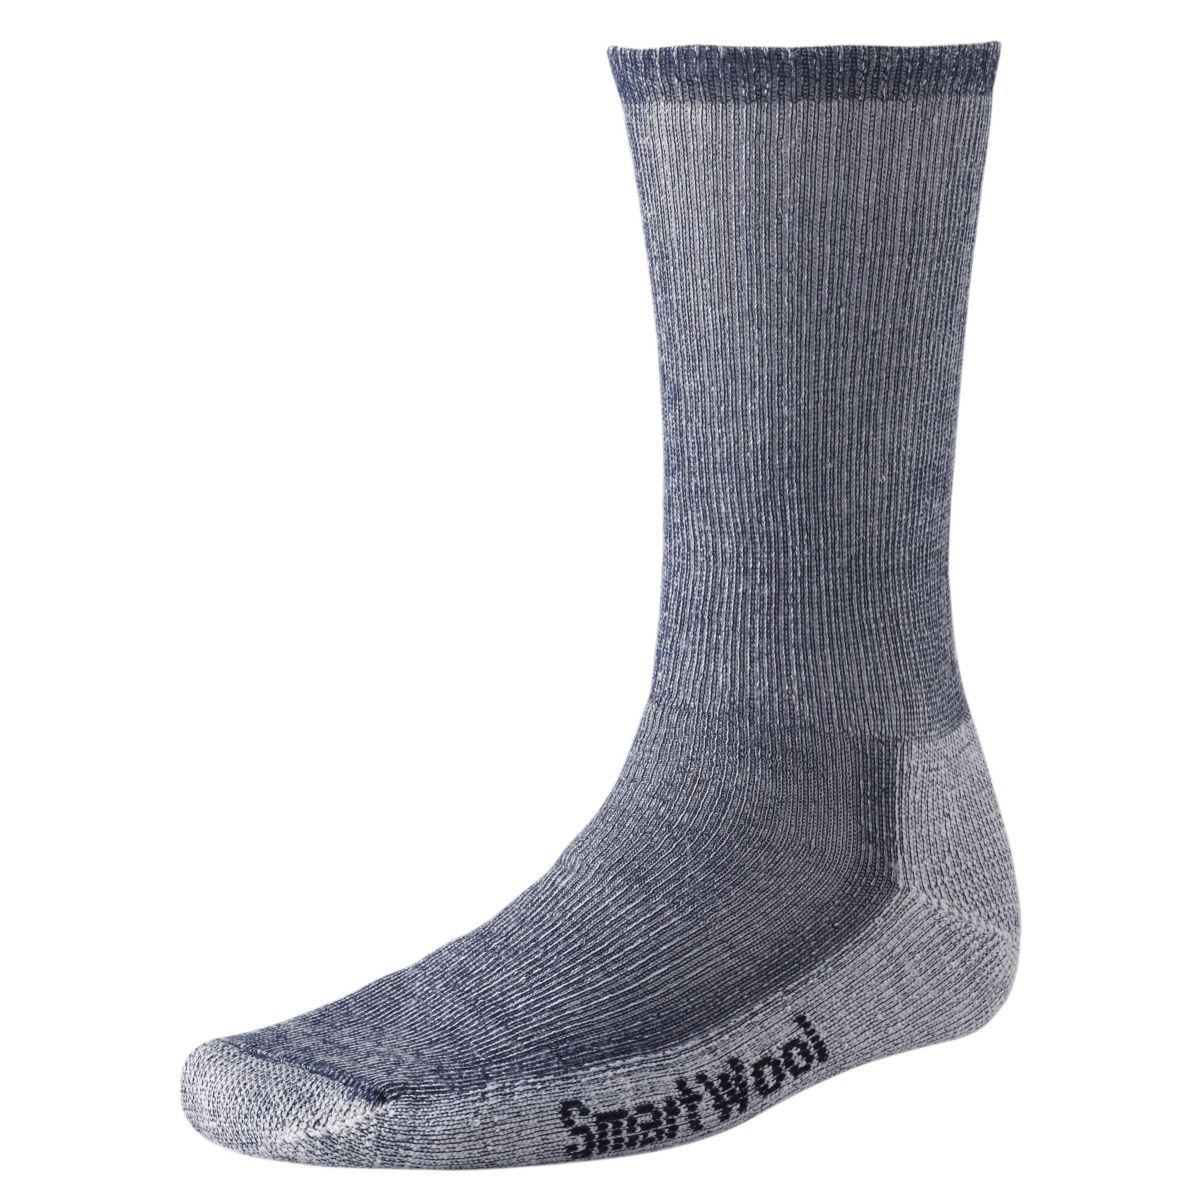 Smartwool Hike Midweight Crew Socks - Blue, XL